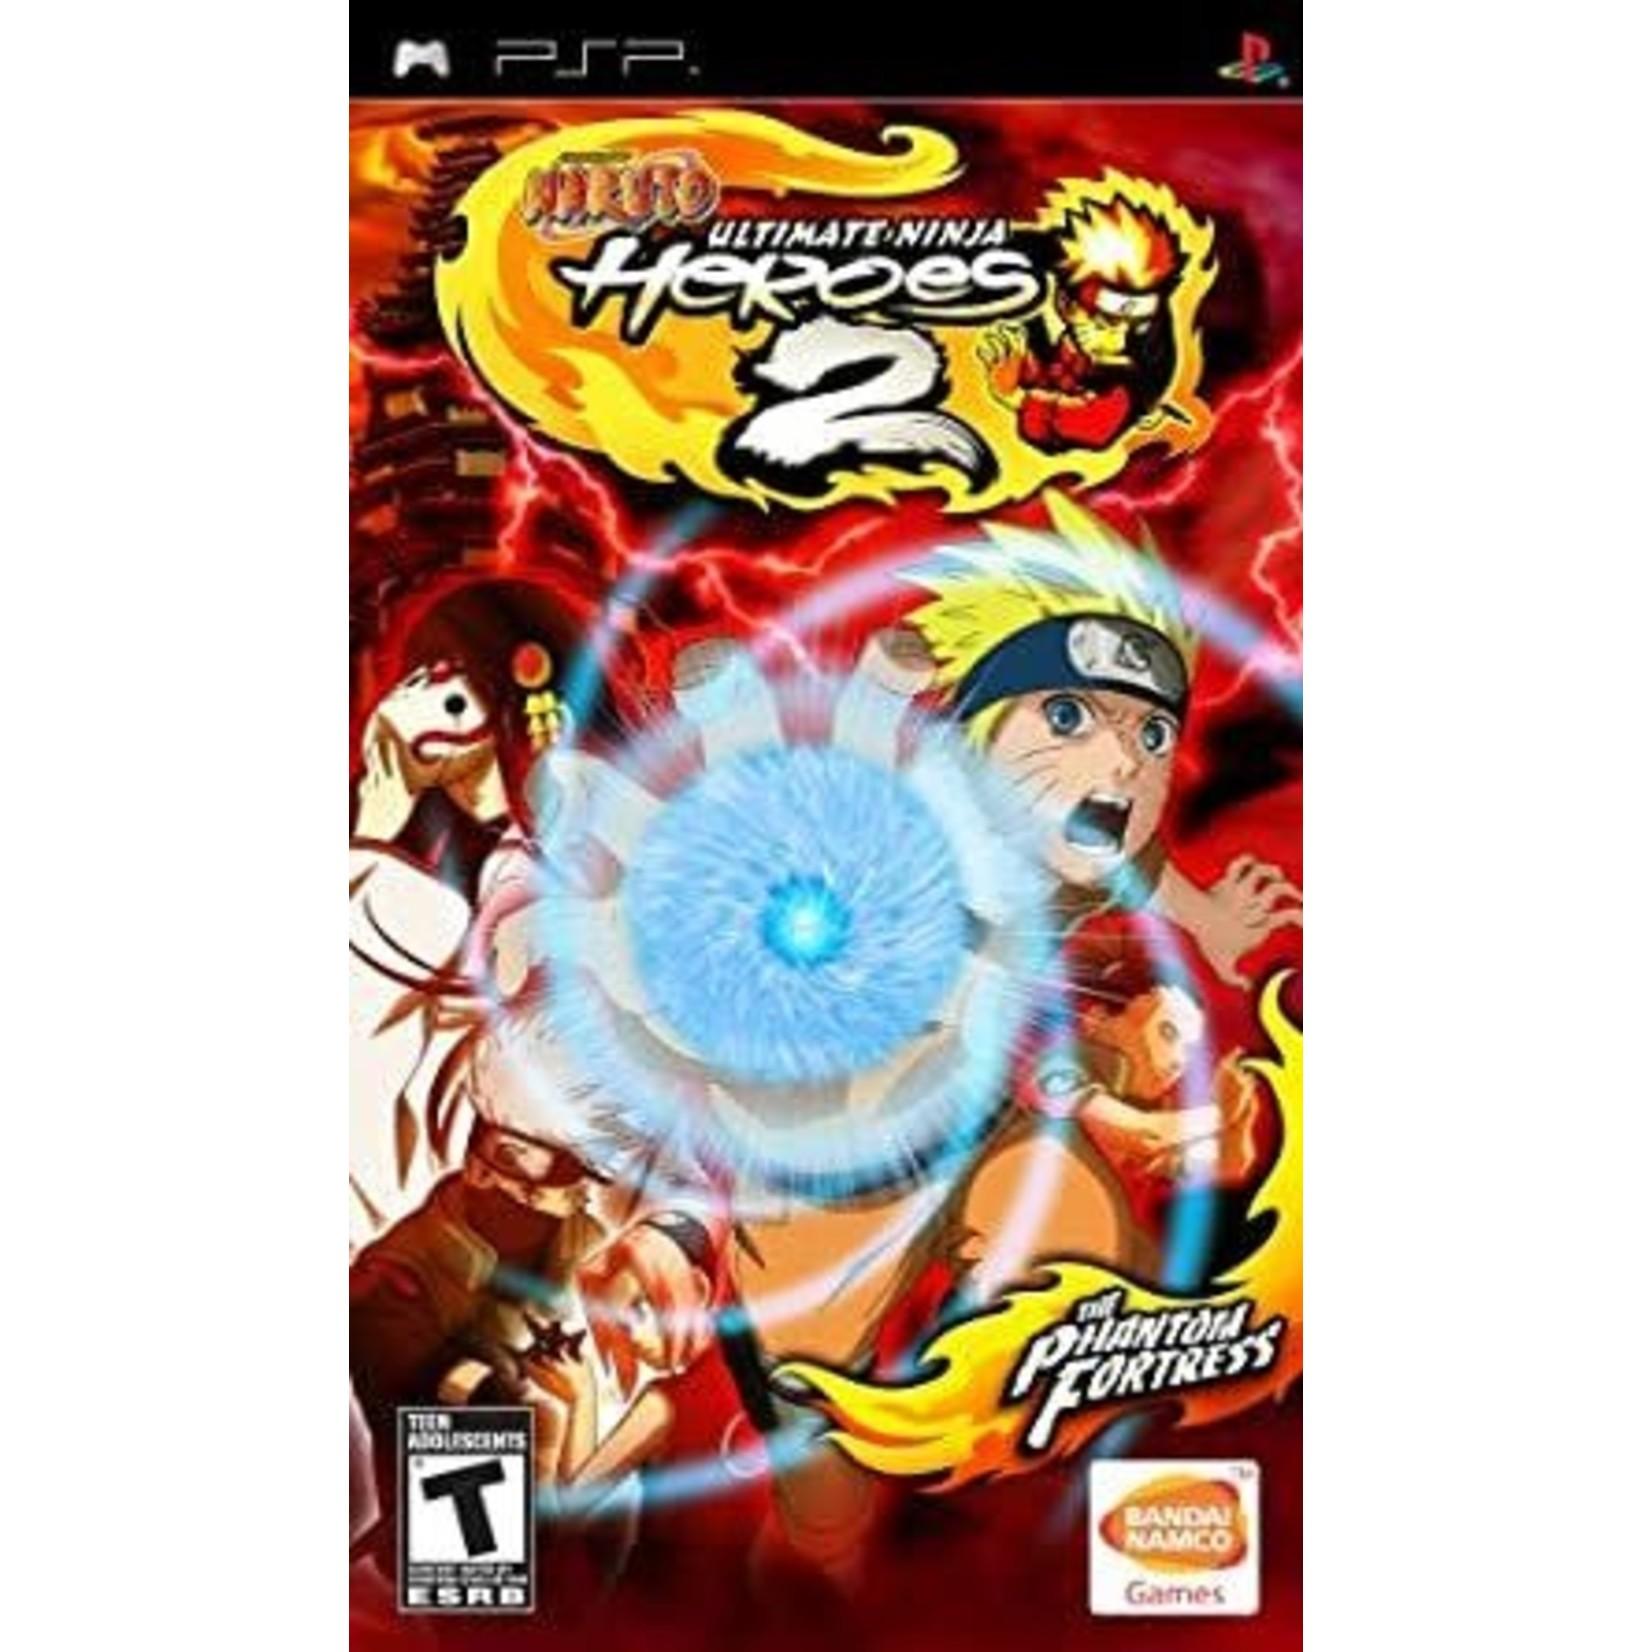 PSPU-Naruto Ultimate Ninja Heroes 2 The Phantom Fortress